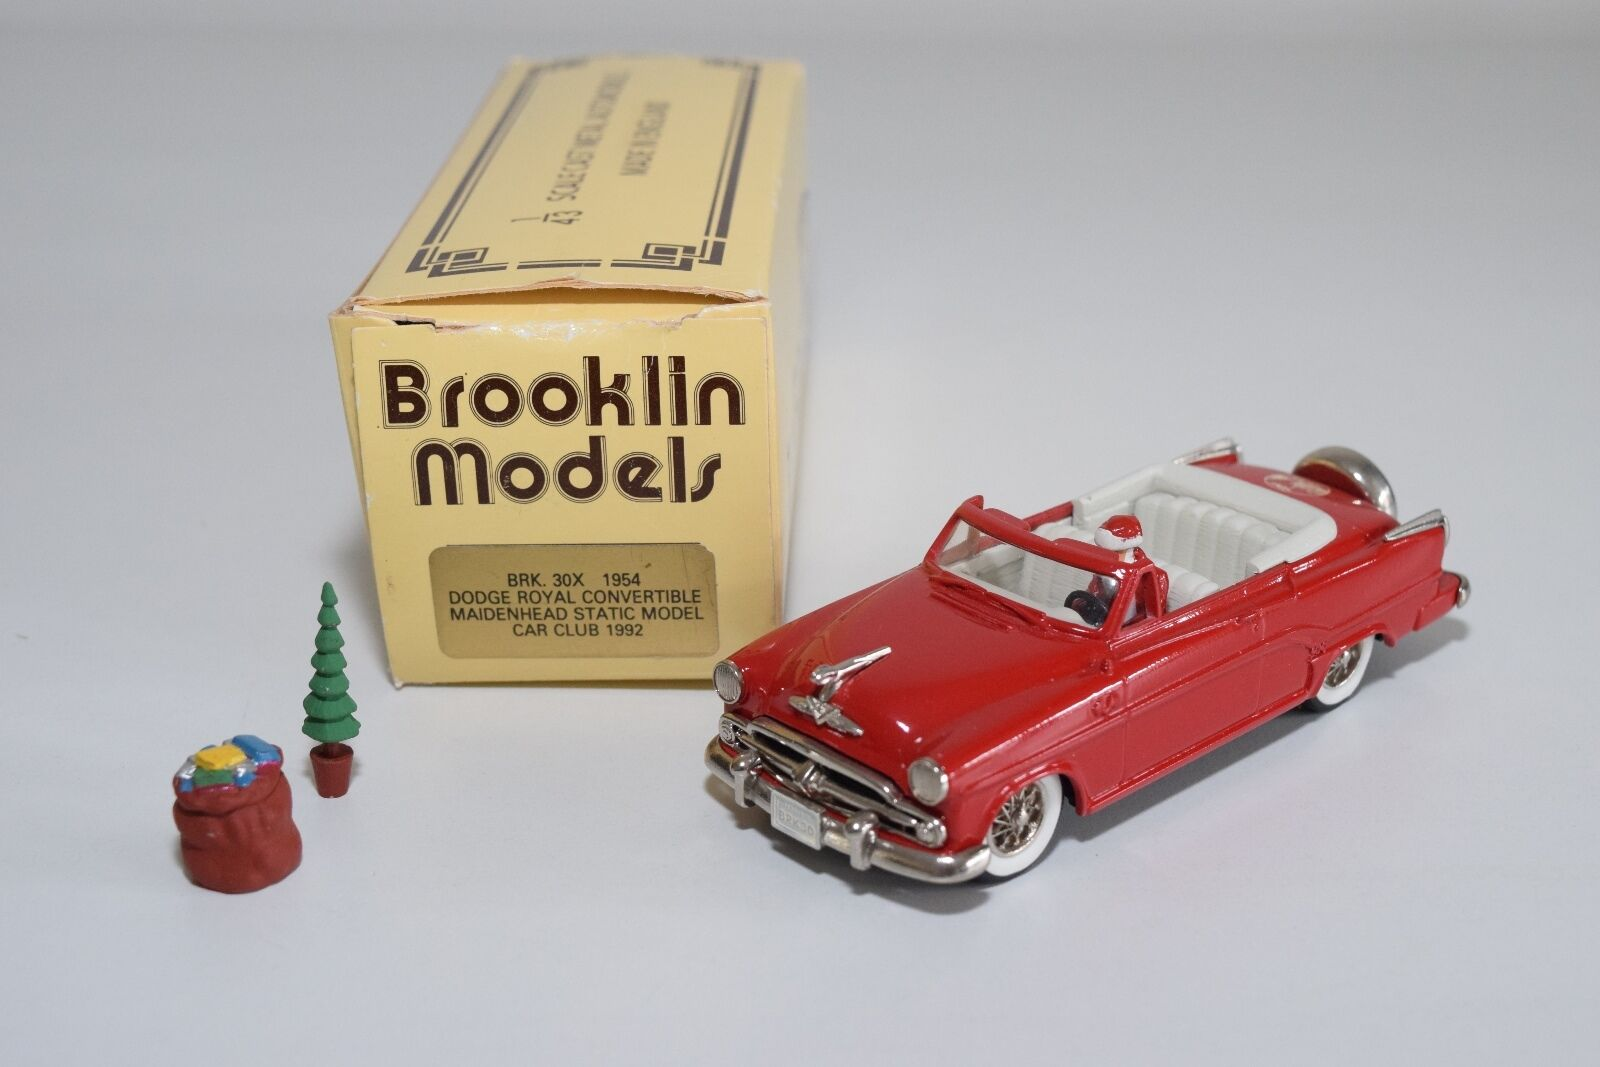 -- BROOKLIN BRK 30X 1954 DODGE ROYAL CONgreenIBLE MSMCC 1992 SANTA MINTBOXED